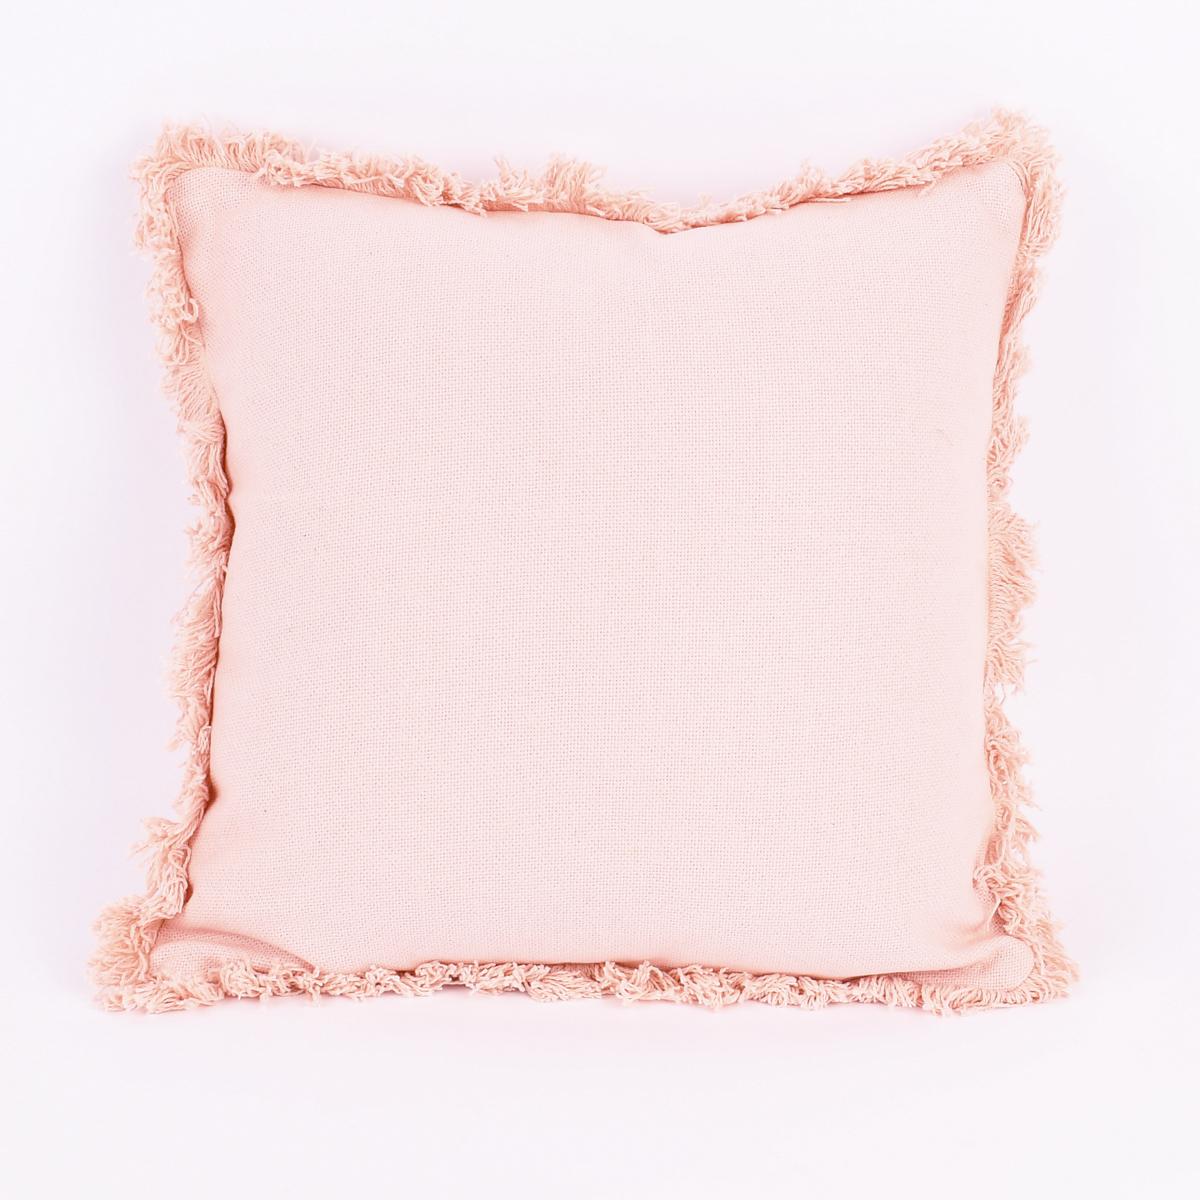 Deko Kissen mit Fransenumrandung rosa 40x40cm